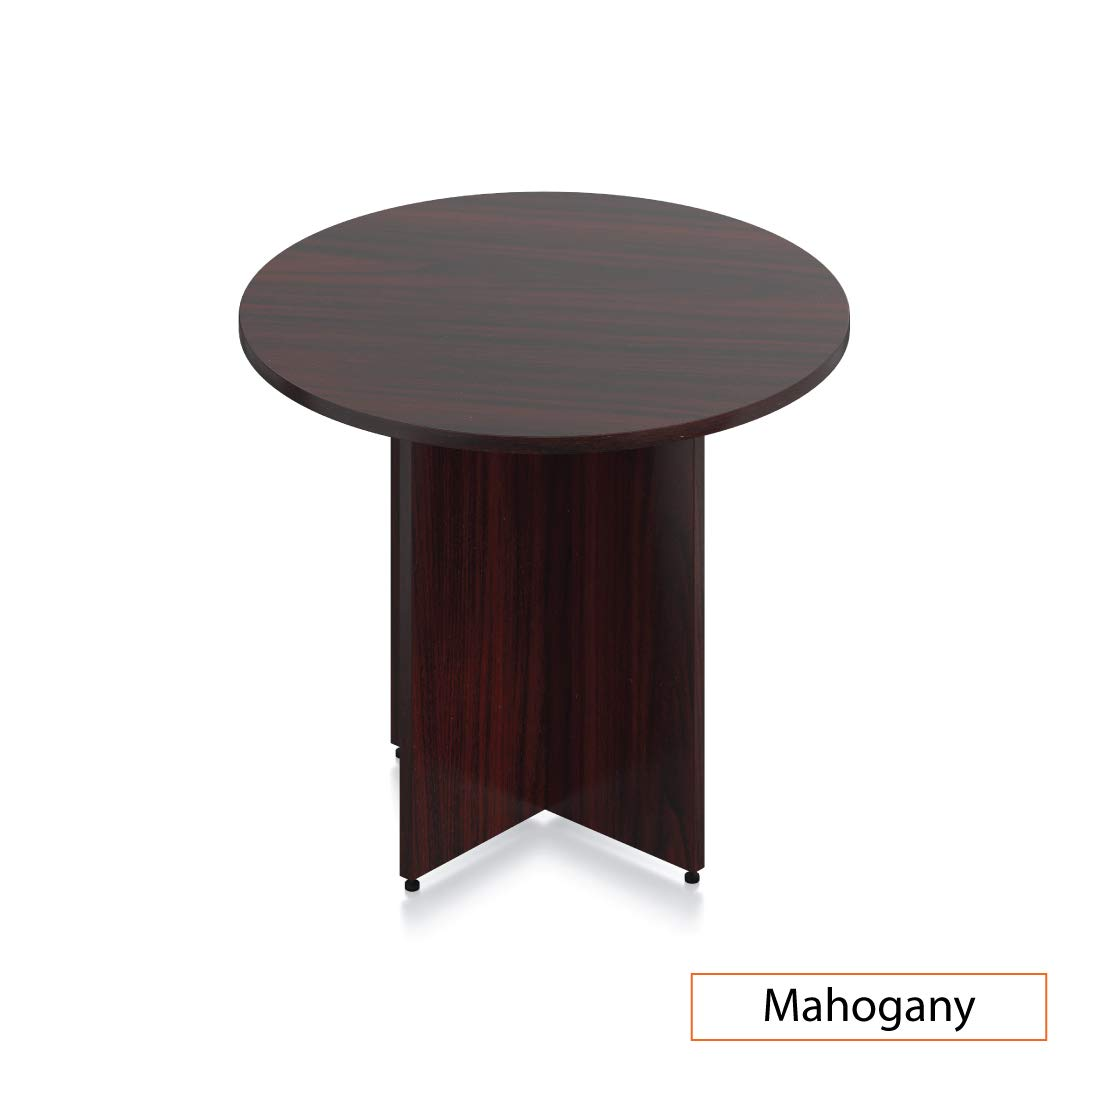 GOF 36'' Round Table (36W x 36D x 29.5H), Cherry, Espresso, Mahogany, Walnut (Mahogany) by GOF